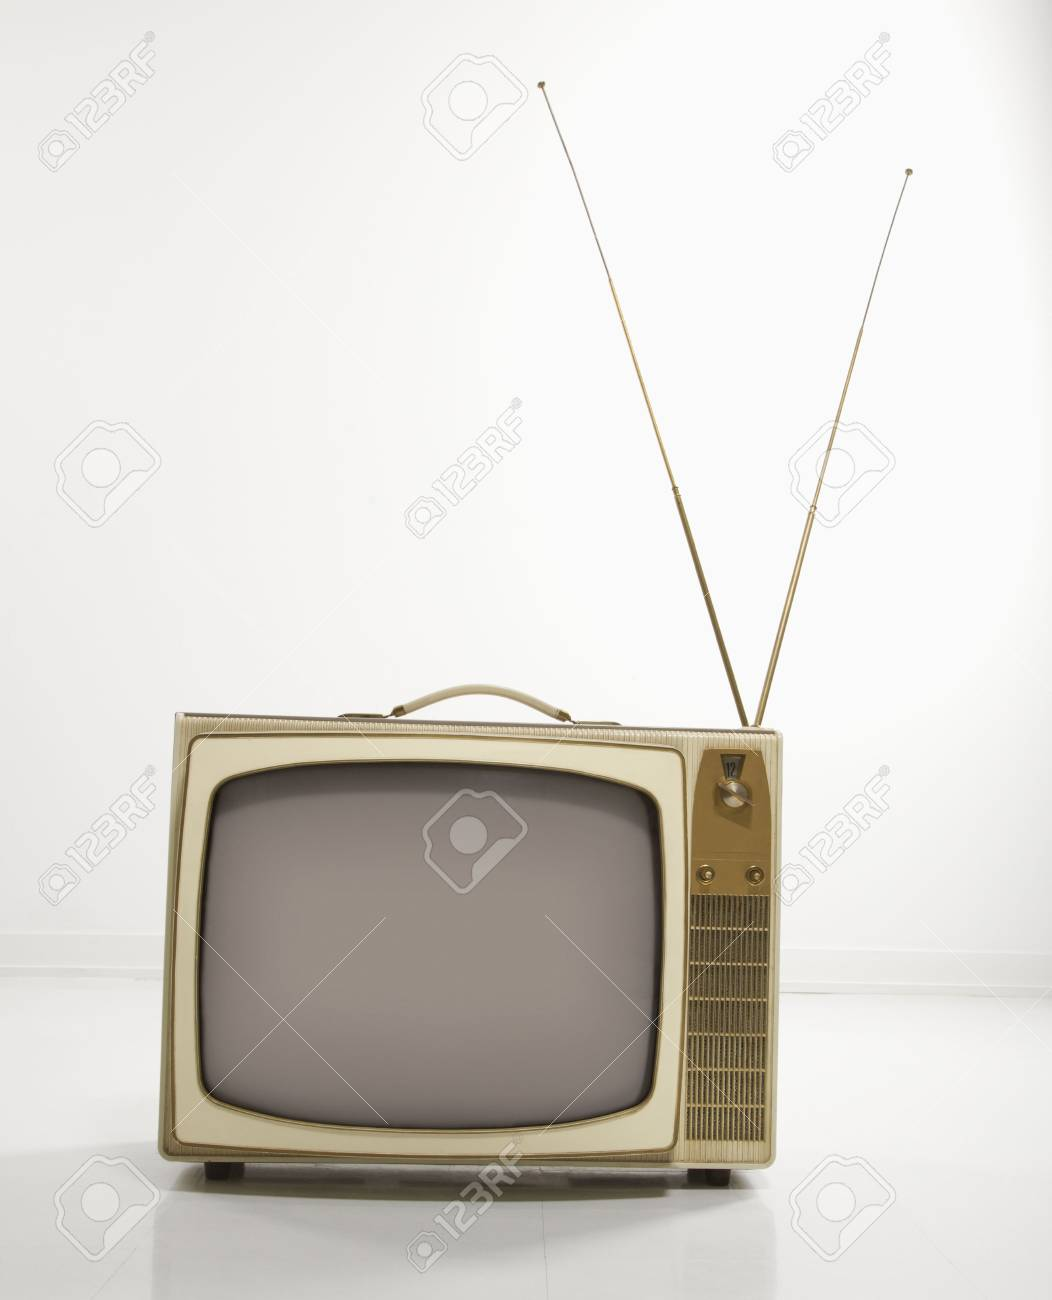 Still life studio shot of retro television. Stock Photo - 2204793